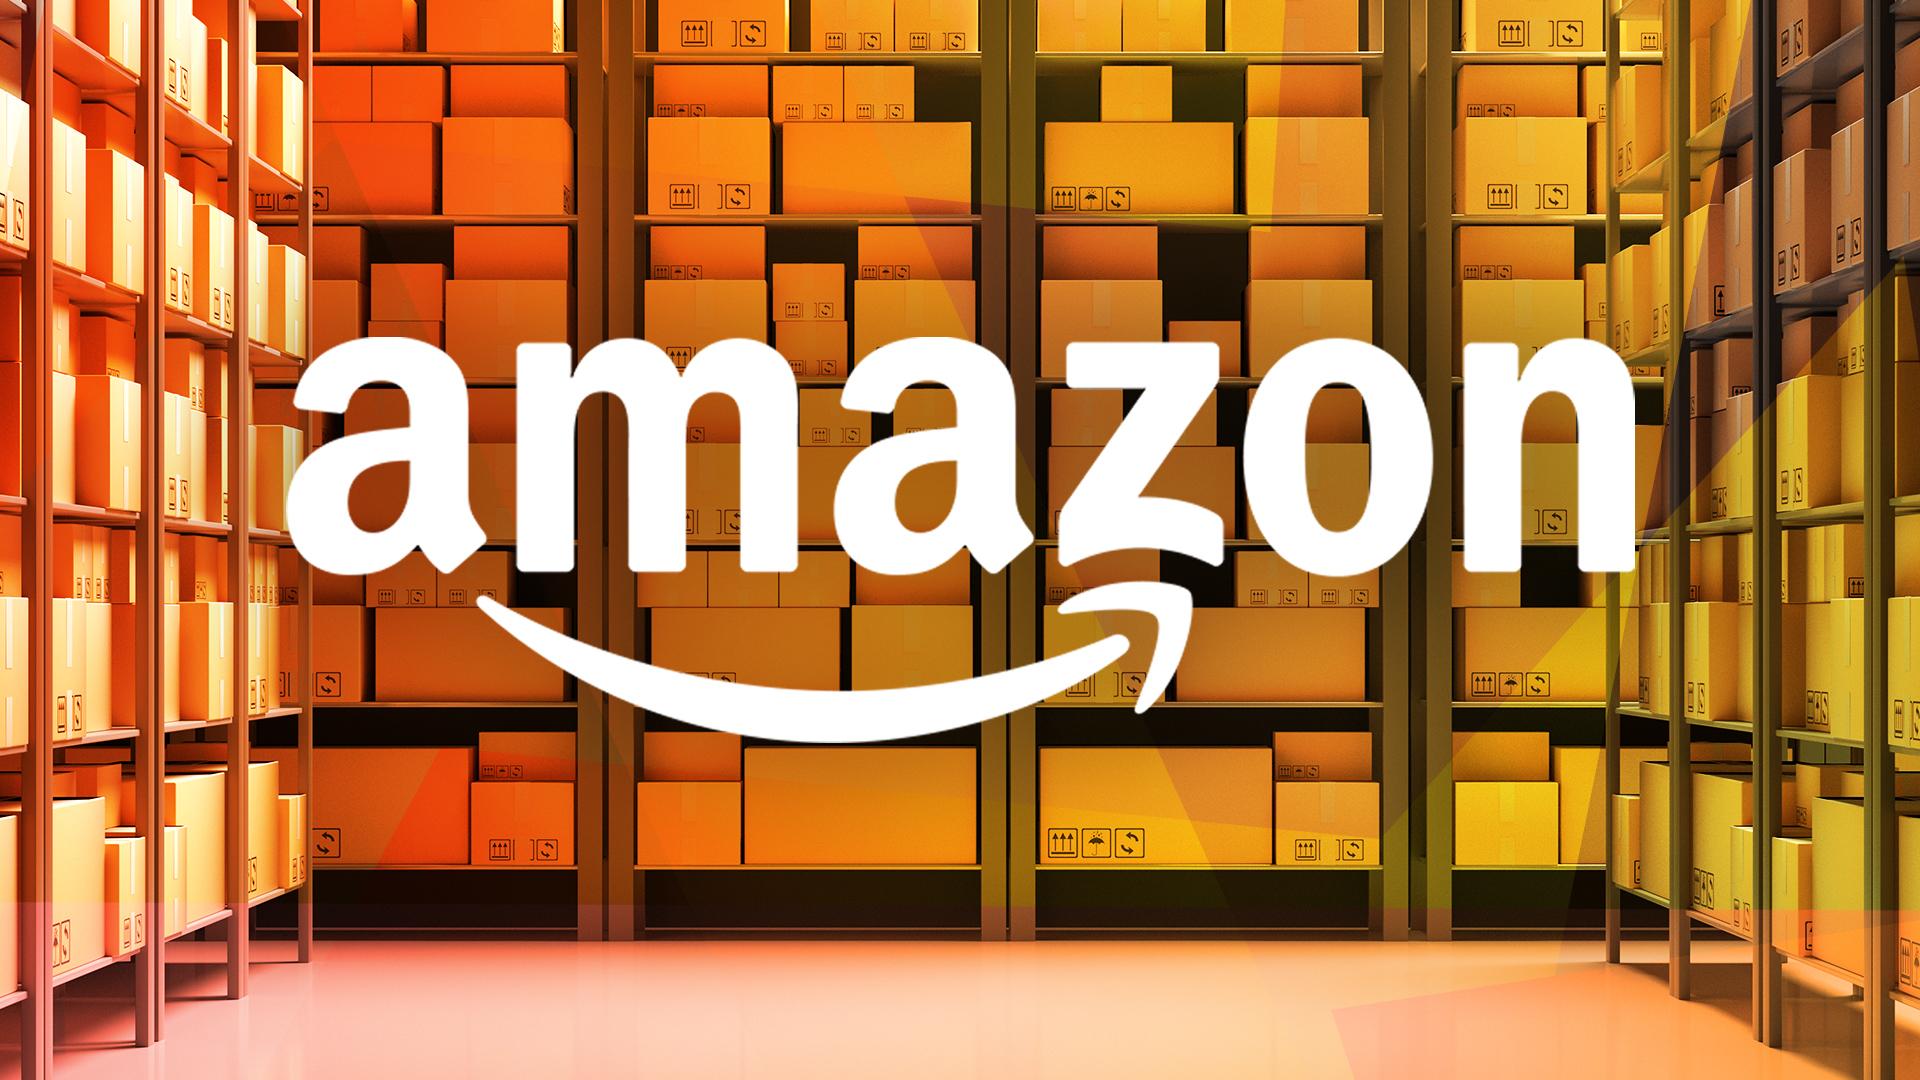 Amazon, shopping, E-Commerce, Logistik, Paket, Logistikzentrum, Pakete, Box, Amazon Logo, Paketdienst, Paketzusteller, Logistikunternehmen, Paketzentrum, Regal, Regale